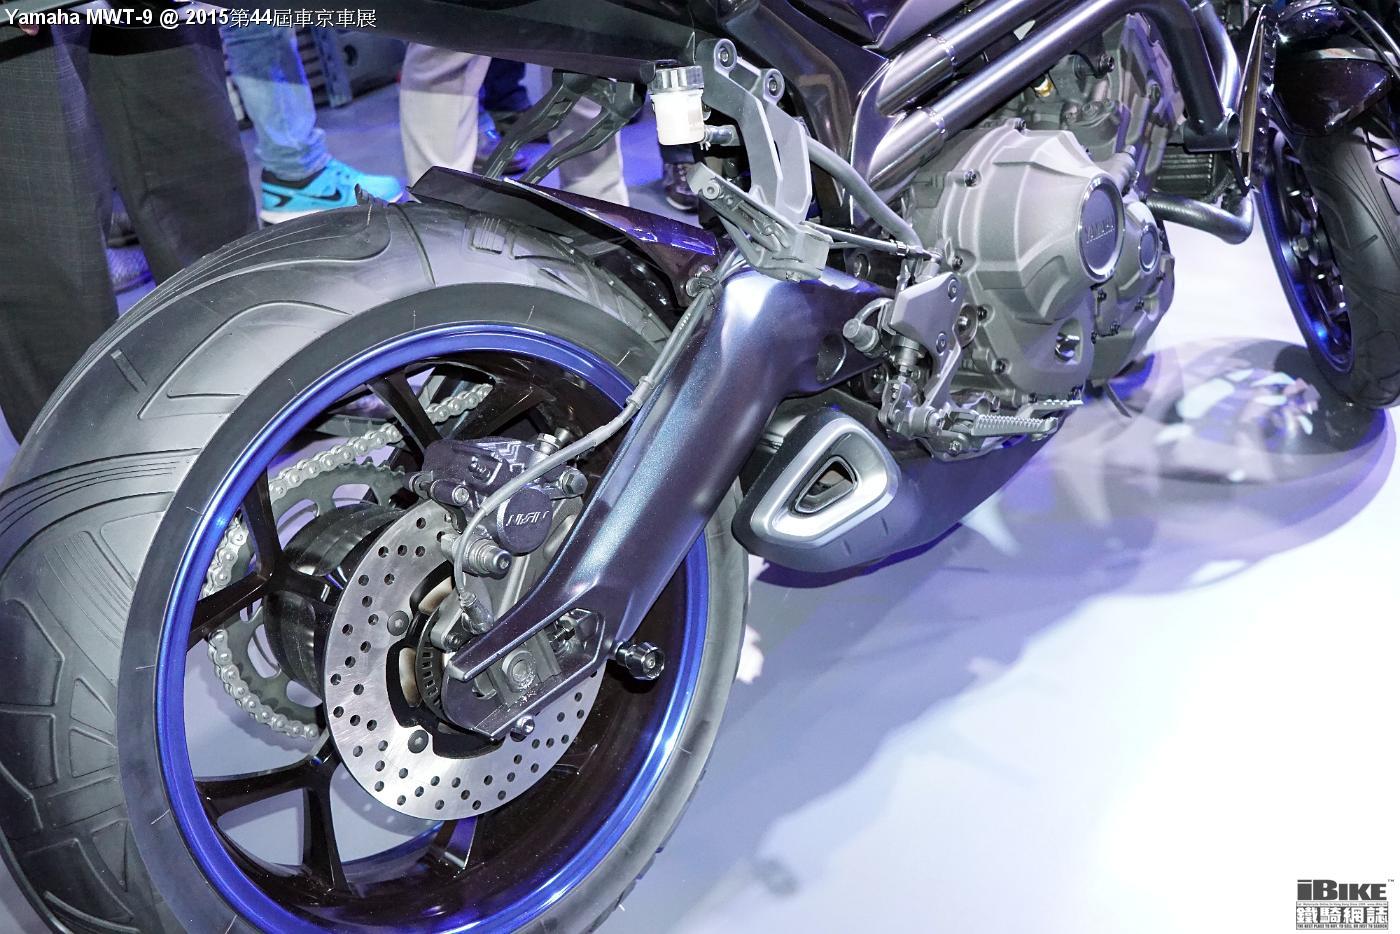 Yamaha Mwt  Release Date